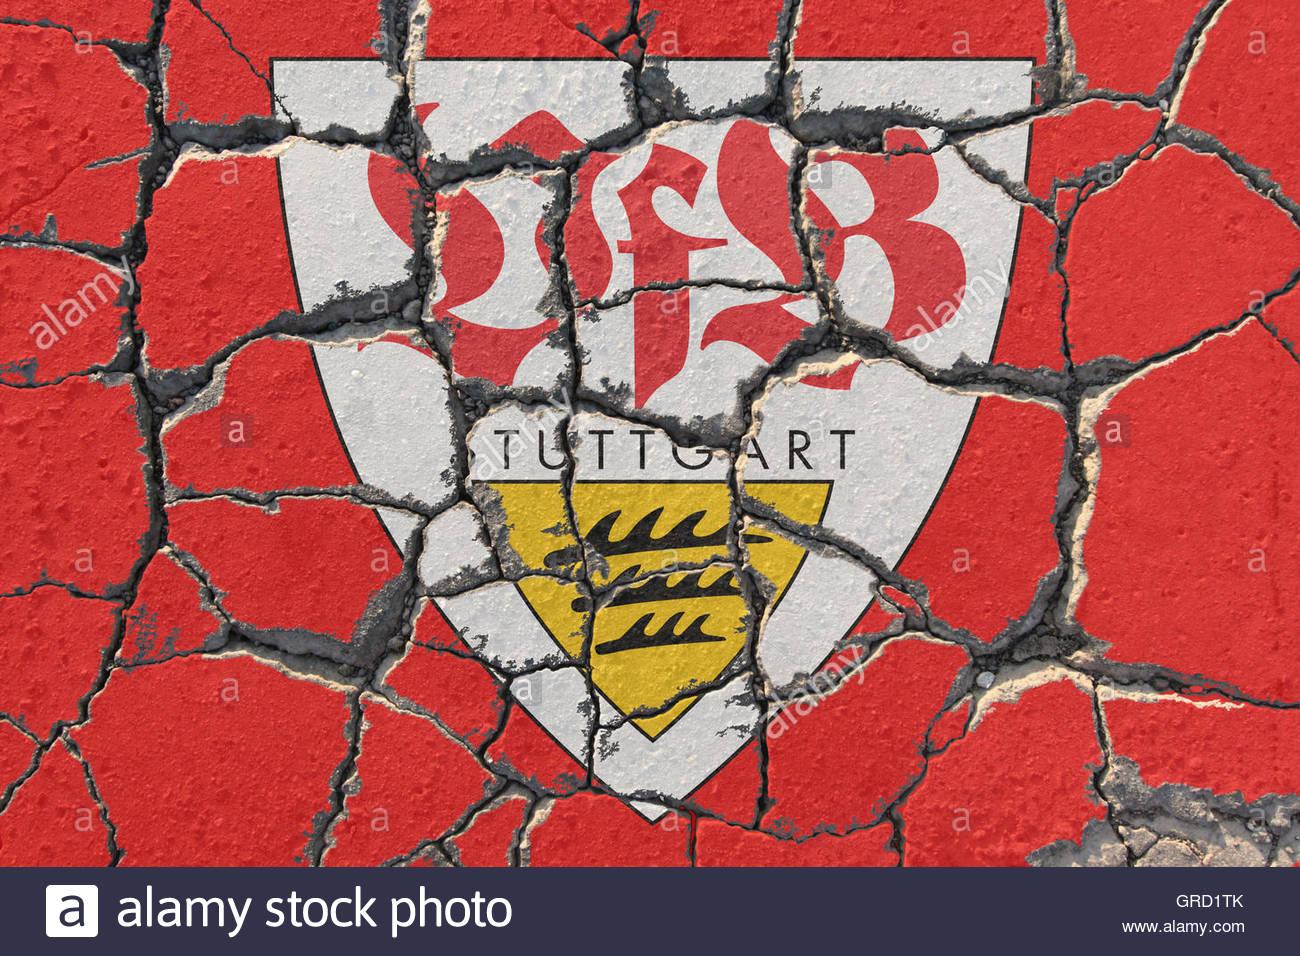 Sign Of Vfb Stuttgart On Eroding Pavement - Stock Image